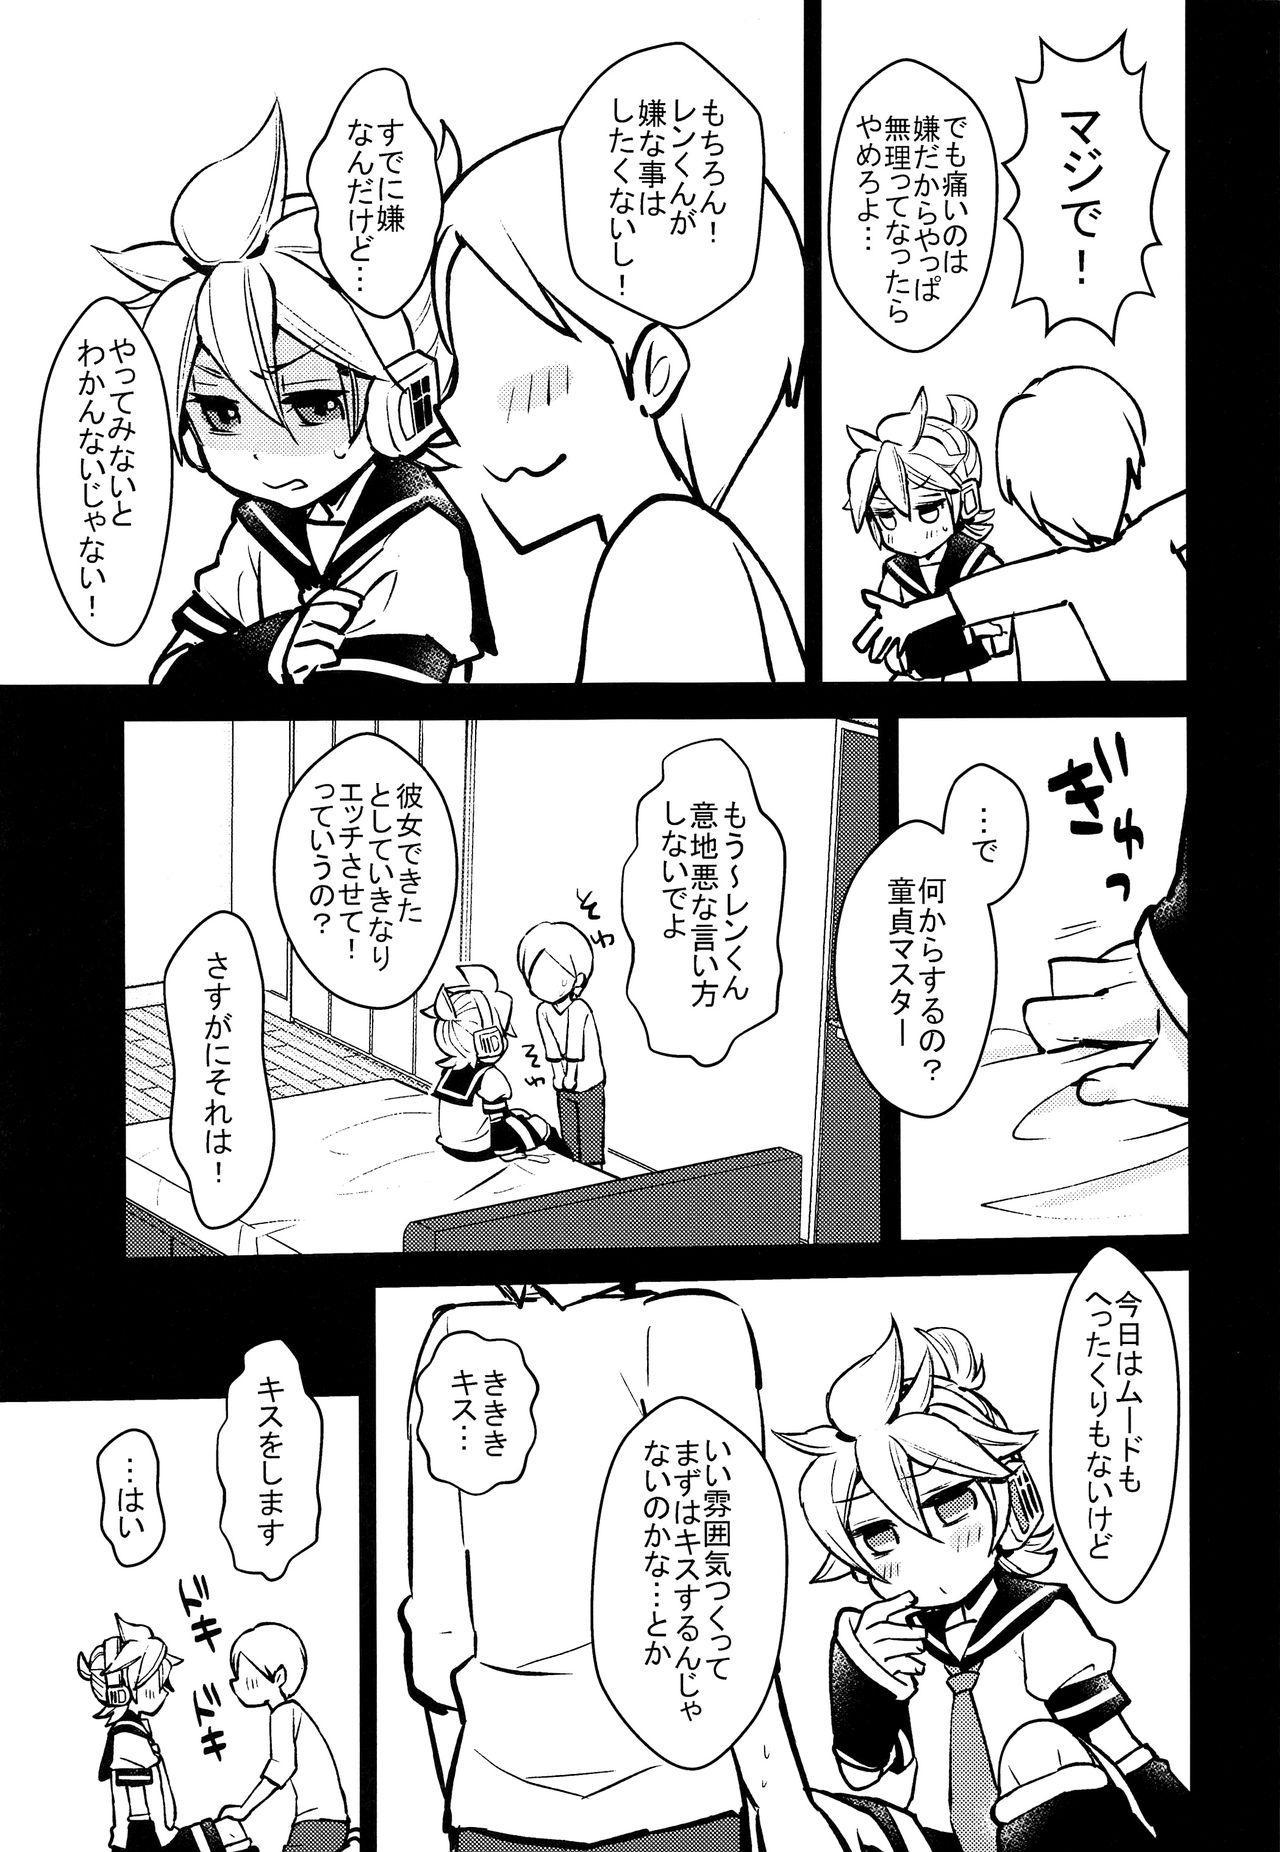 Len-kun Onegai! 9